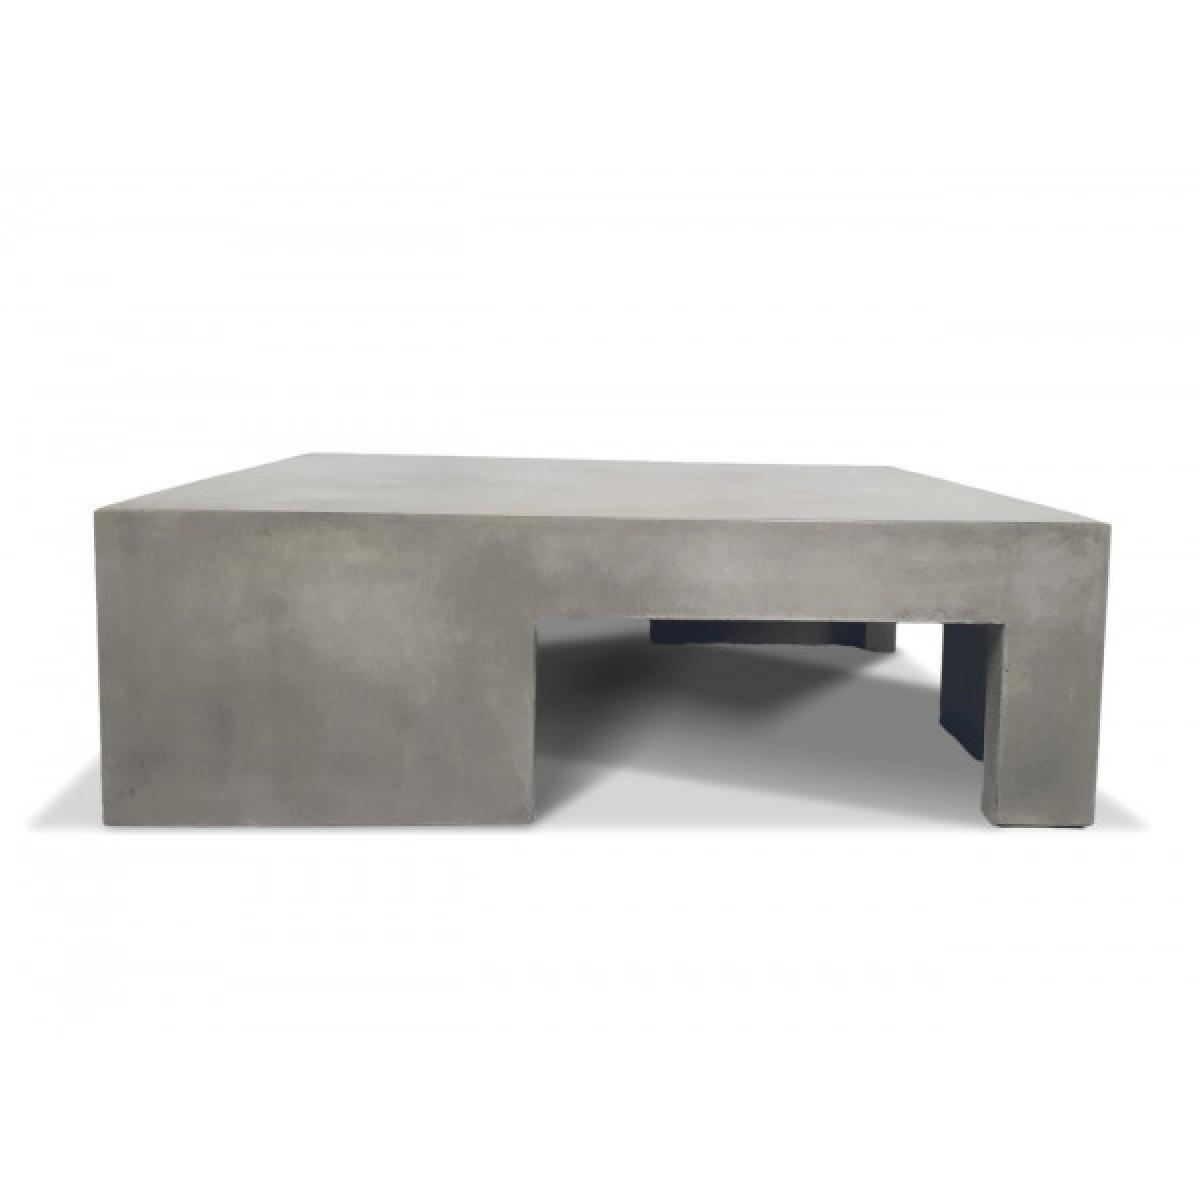 Mathi Design BETON - Table basse carrée Cubic